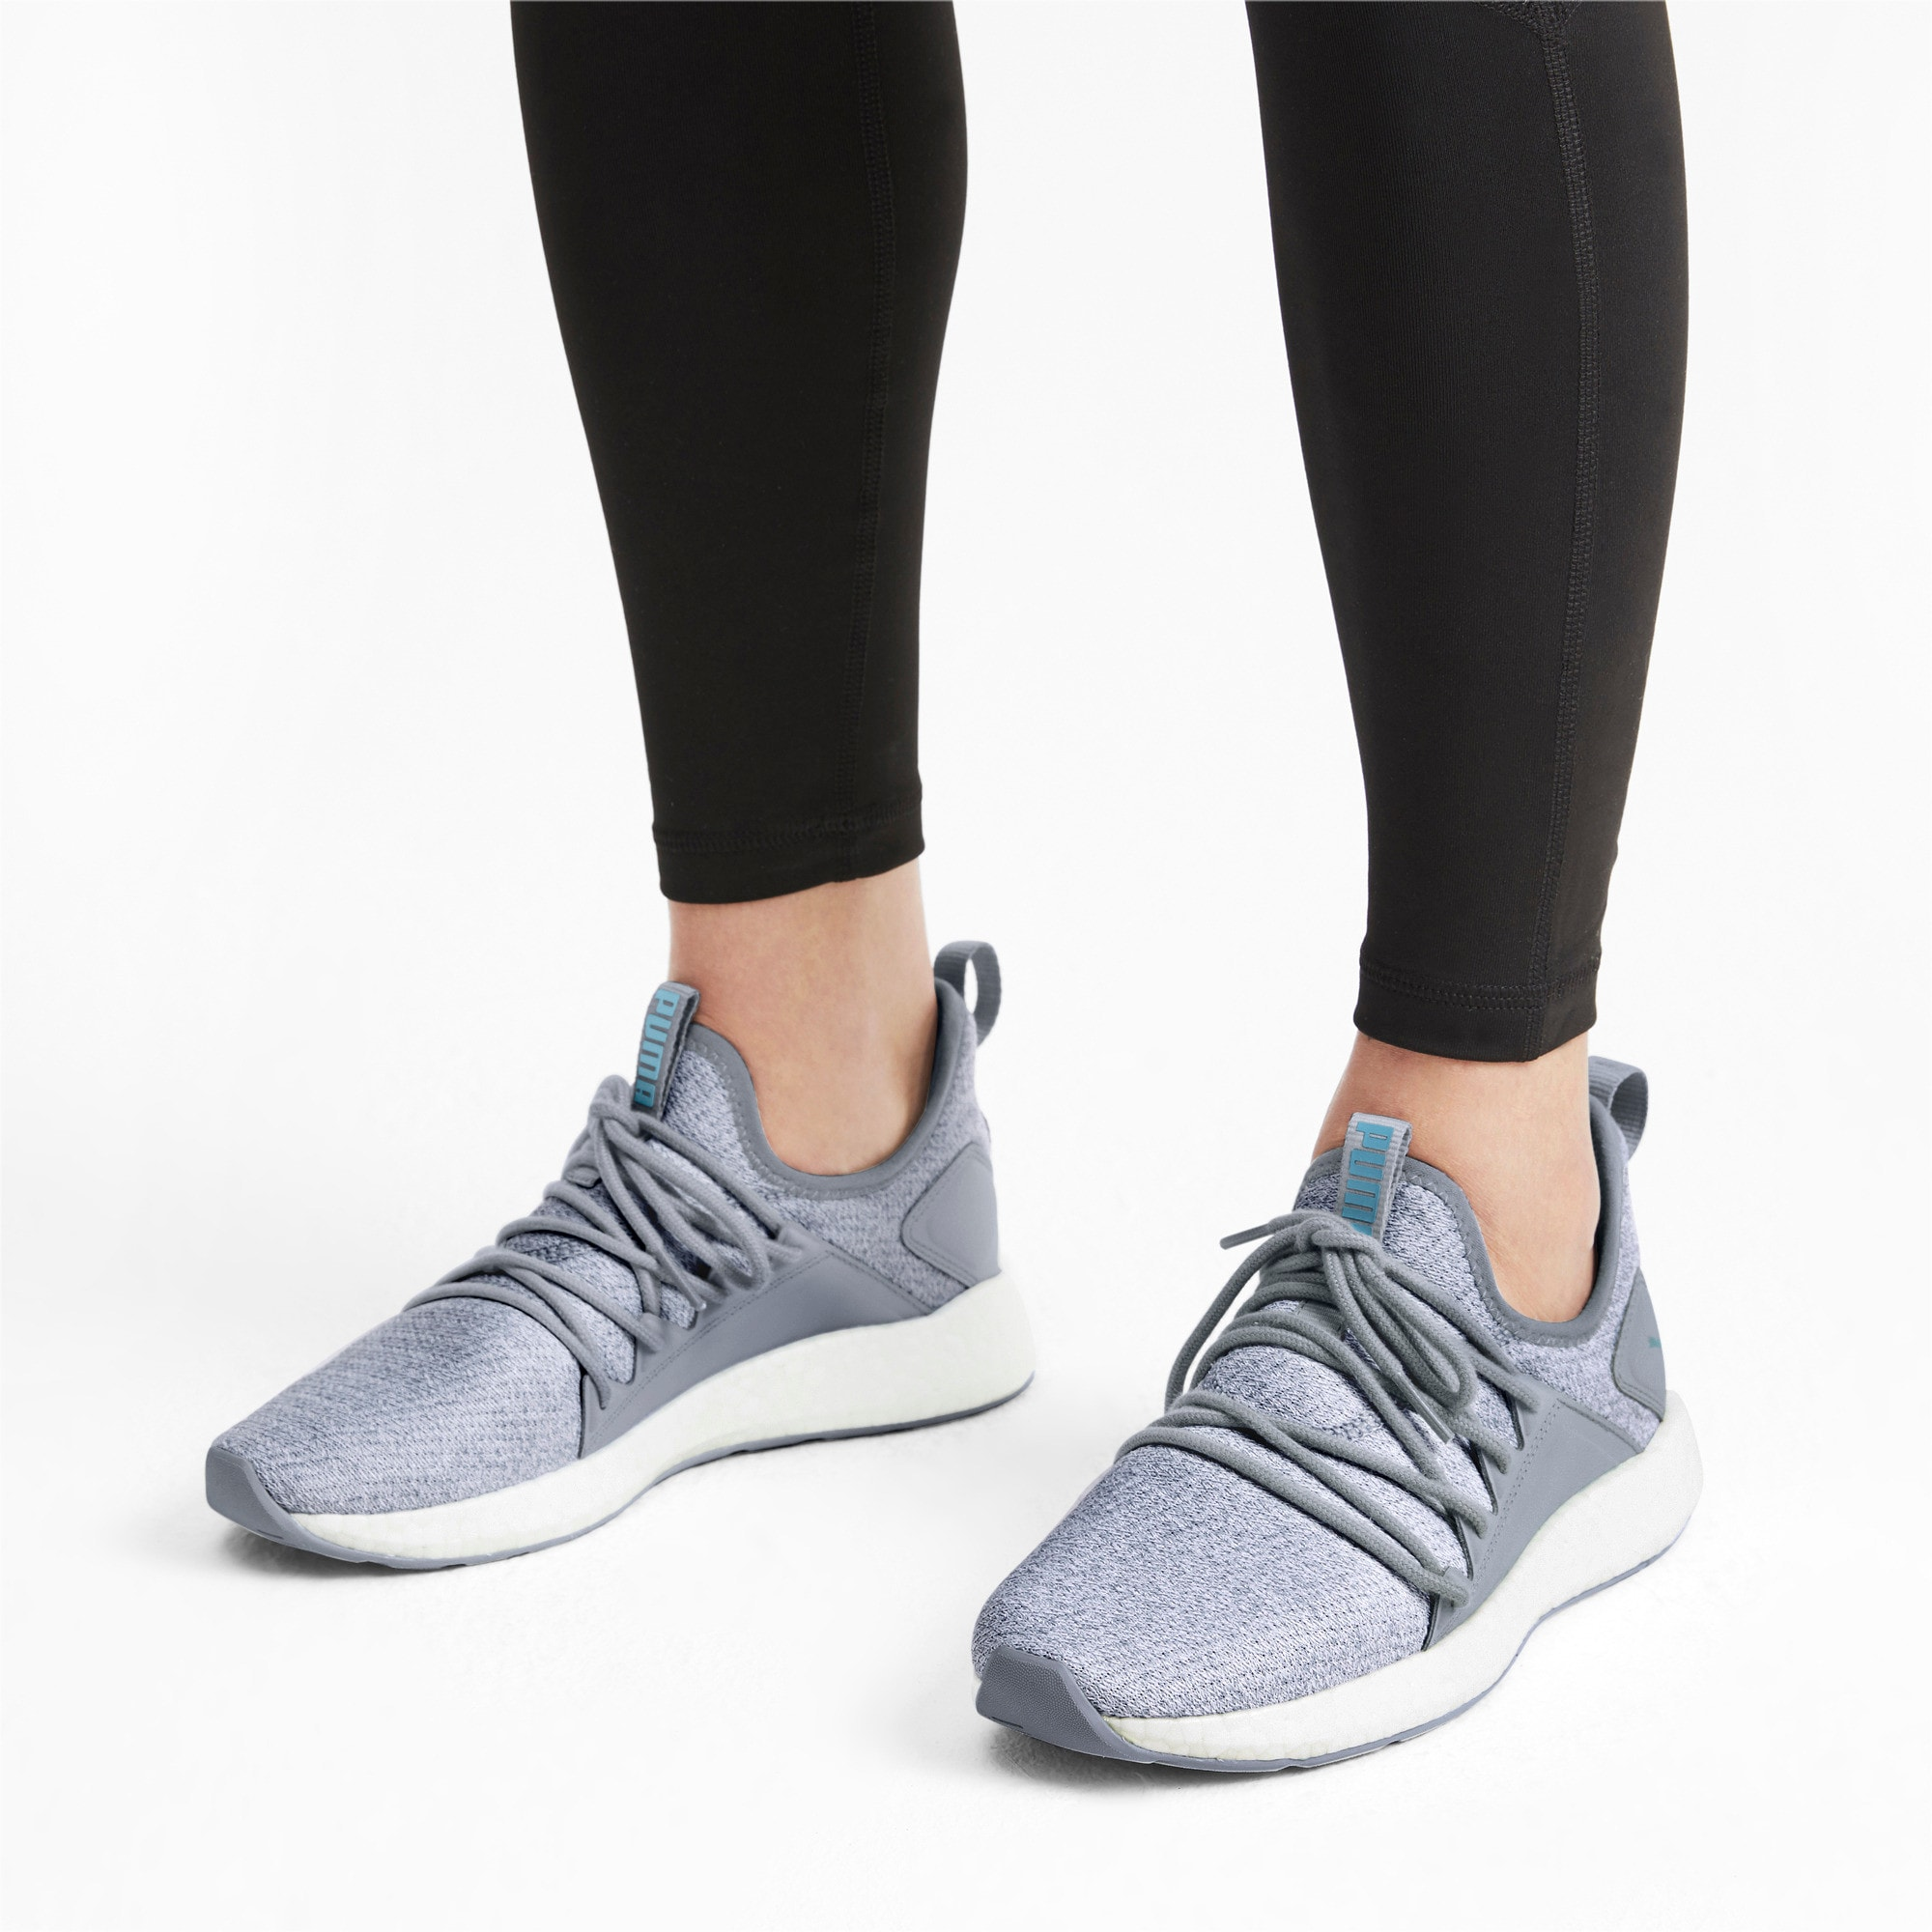 Thumbnail 2 of NRGY Neko Knit Women's Running Shoes, Quarry, medium-IND